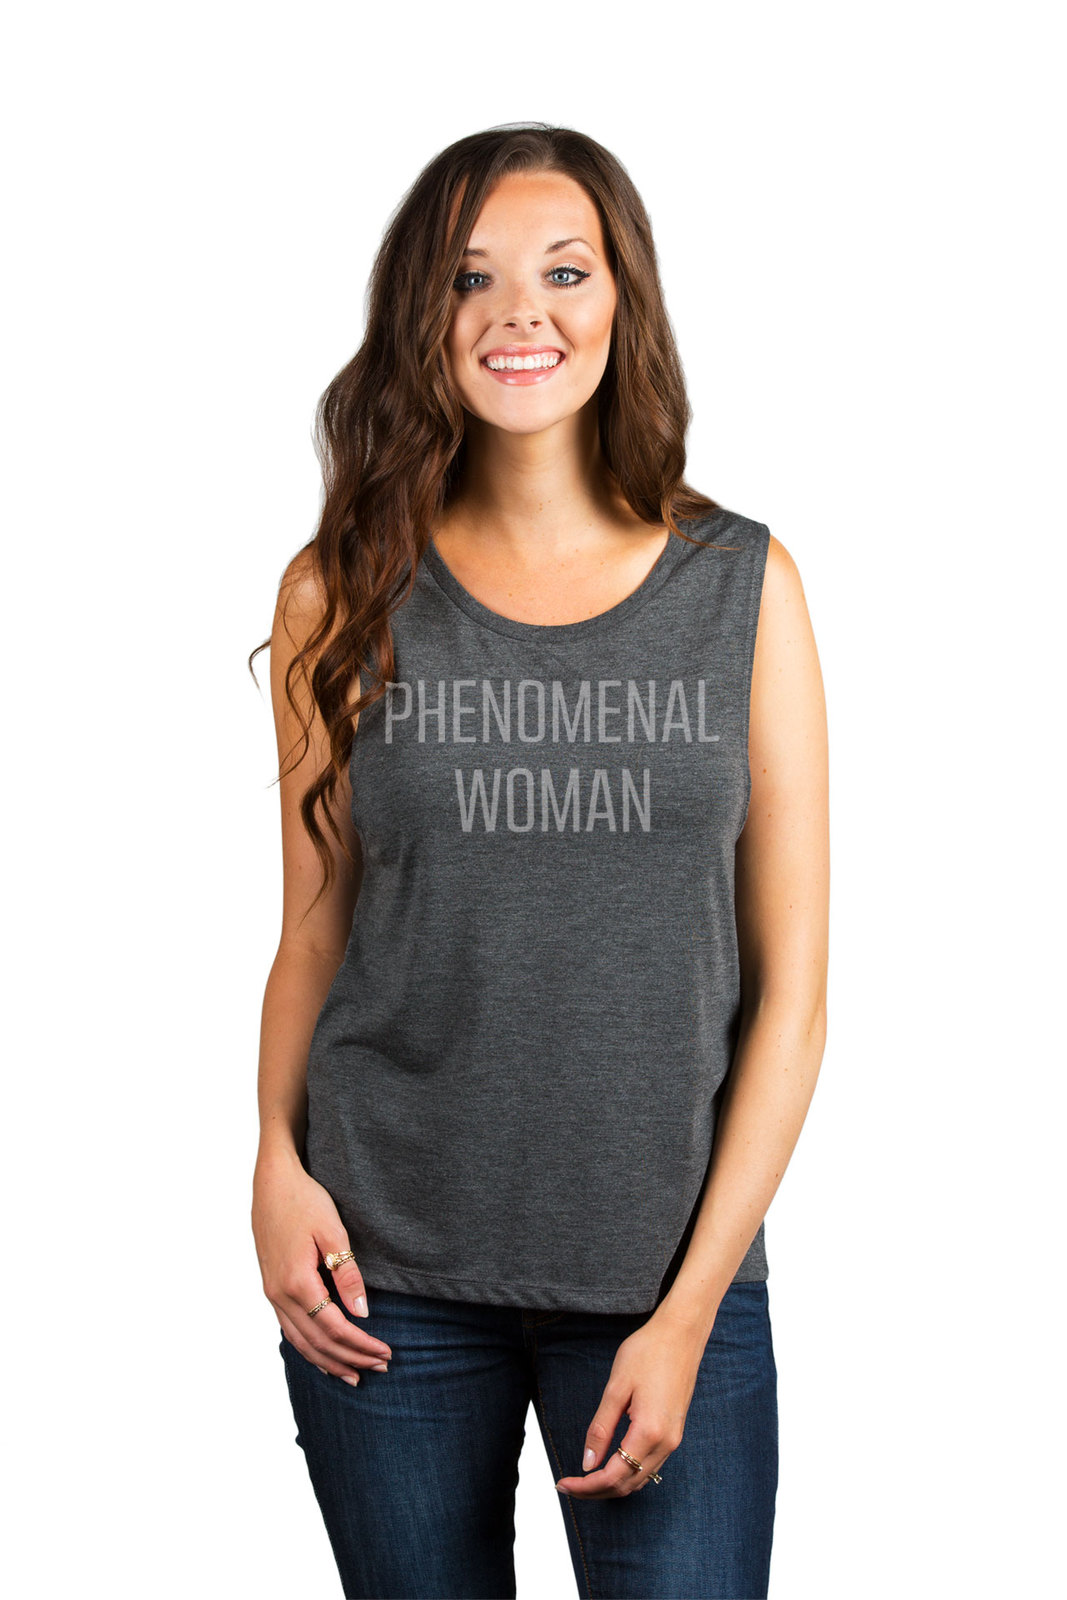 Thread Tank Phenomenal Woman Women's Sleeveless Muscle Tank Top Tee Charcoal Gre